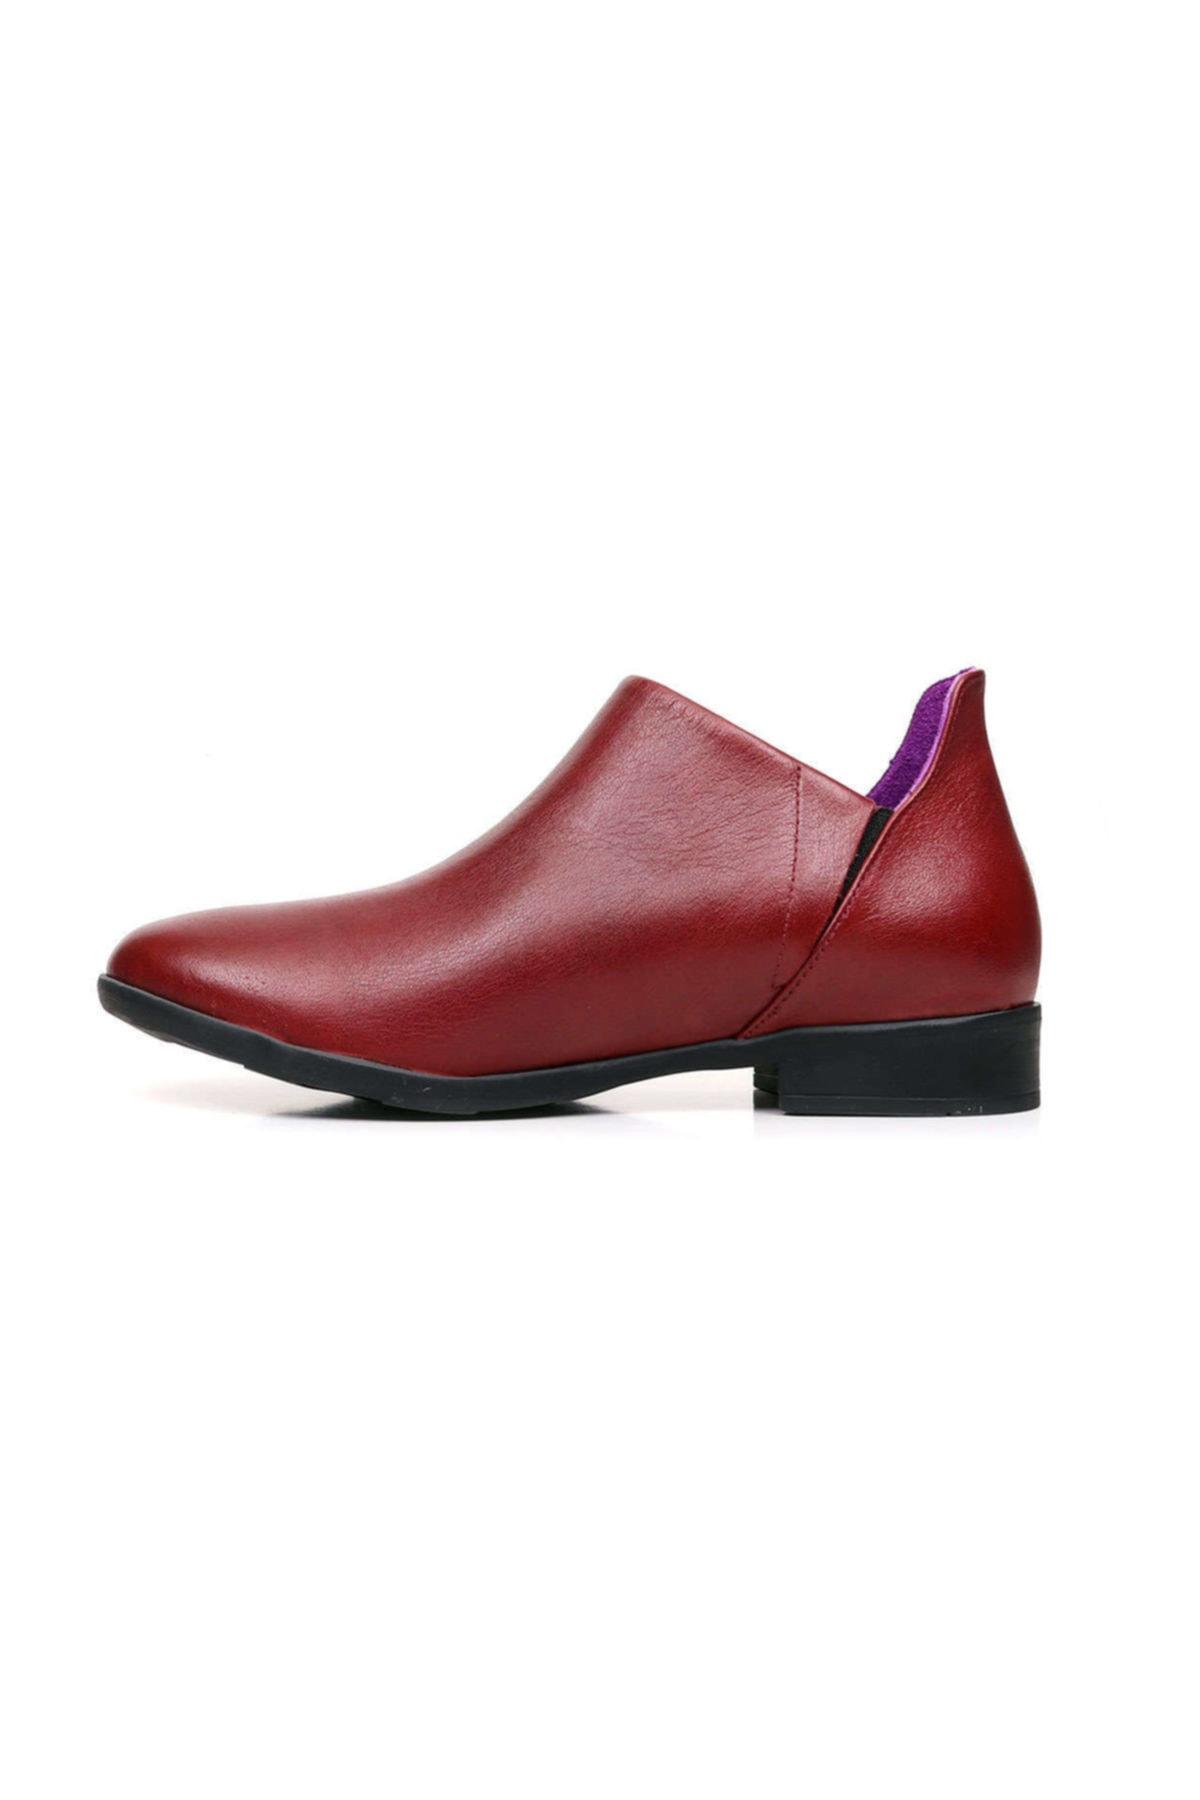 BUENO Shoes  Kadın Ayakkabı 9p2300 2